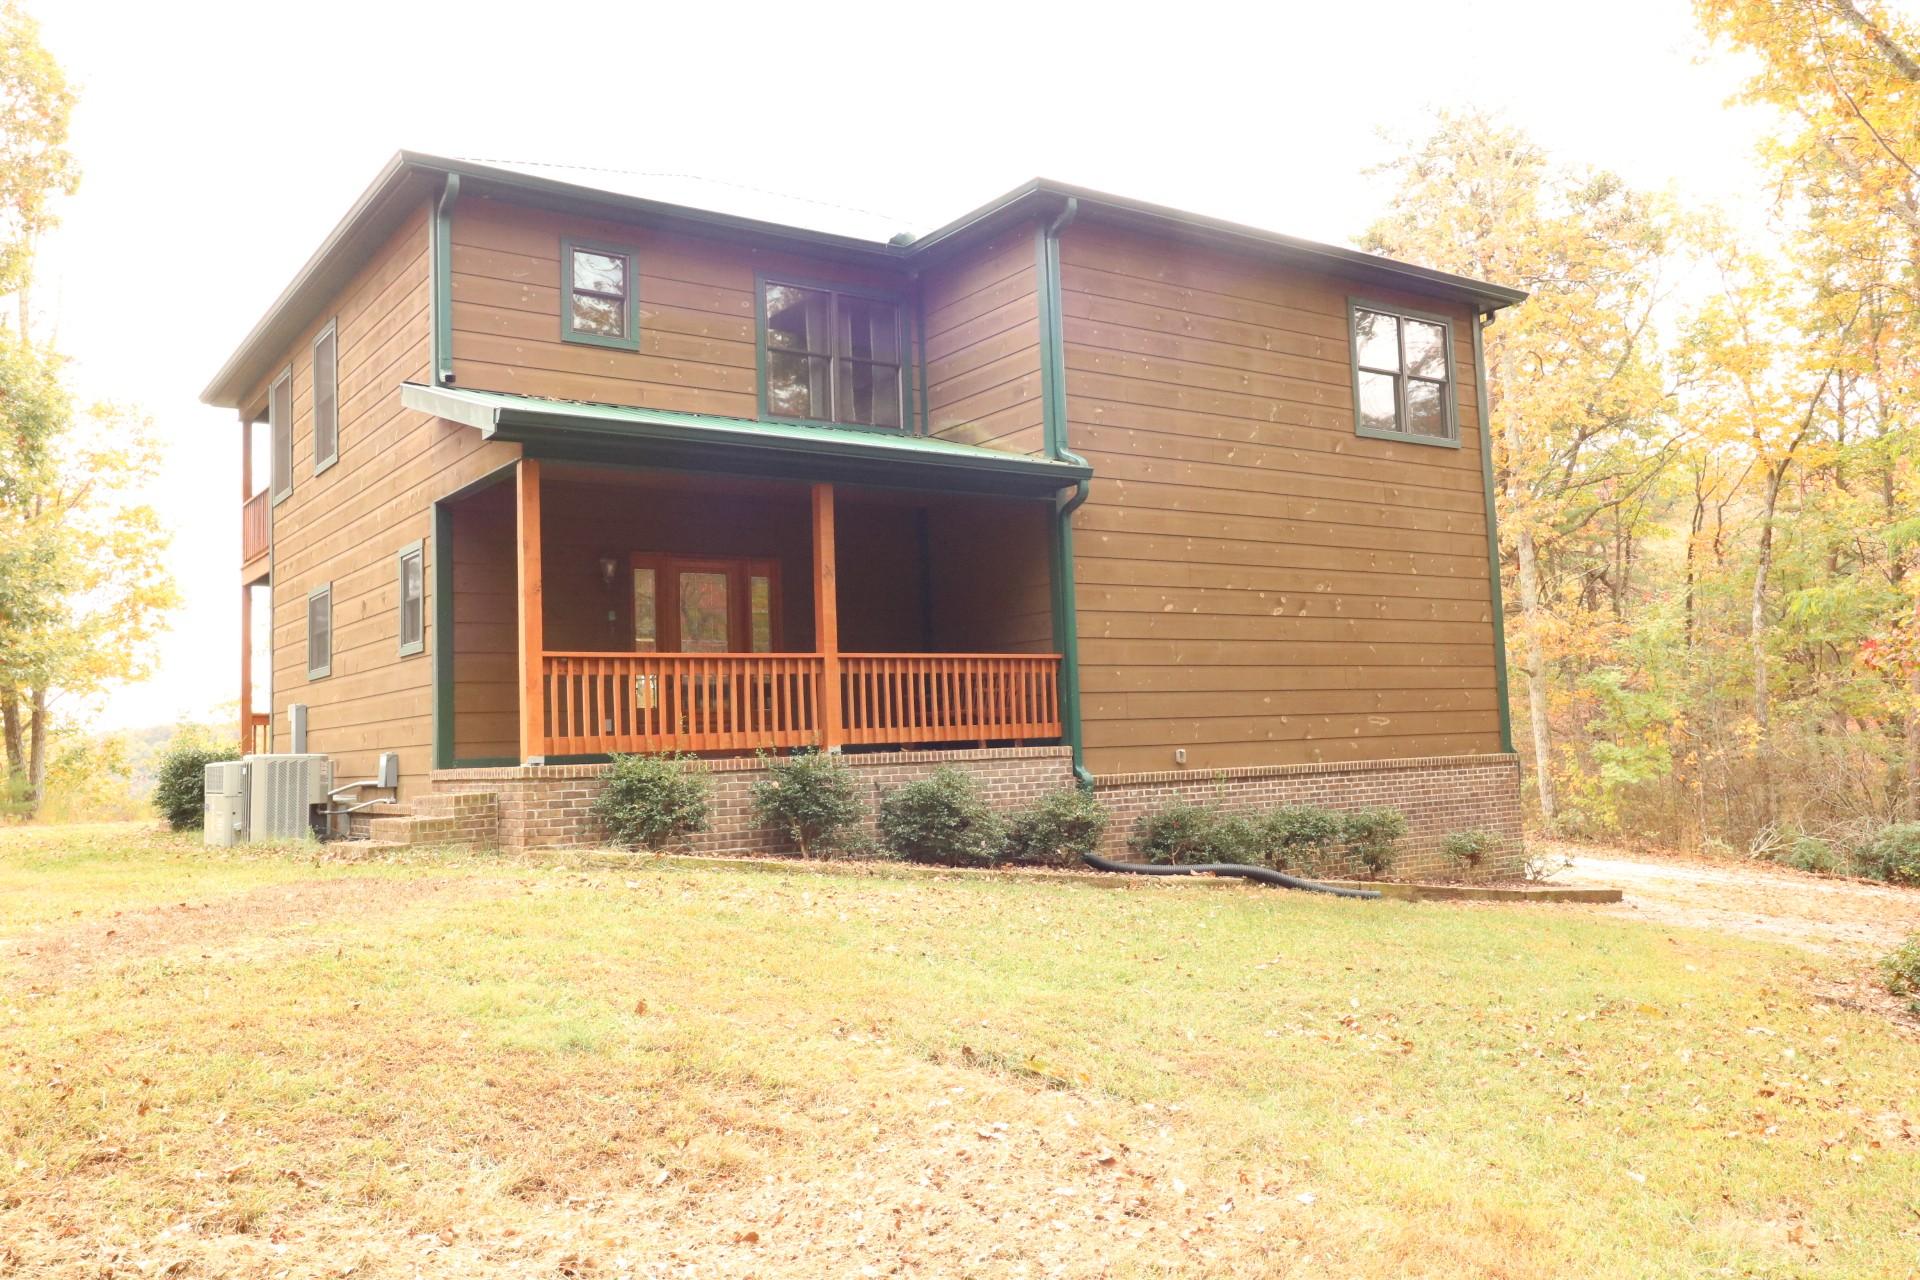 1402 Cooleys Rift Blvd, N, Monteagle, TN 37356 - Monteagle, TN real estate listing